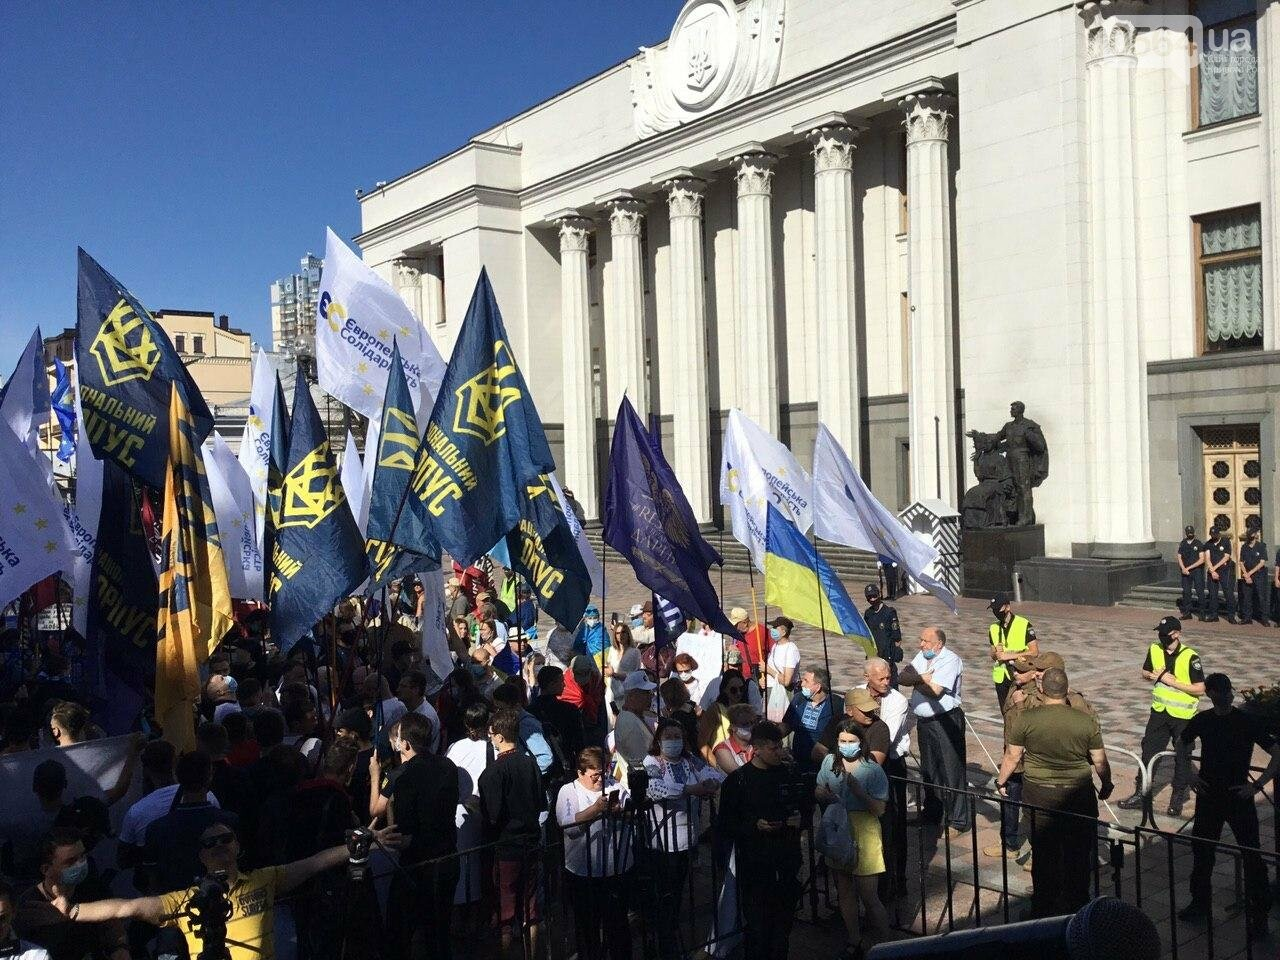 """Руки геть від мови"": под стенами Верховной рады проходит акция протеста, - ФОТО, ВИДЕО, фото-30"